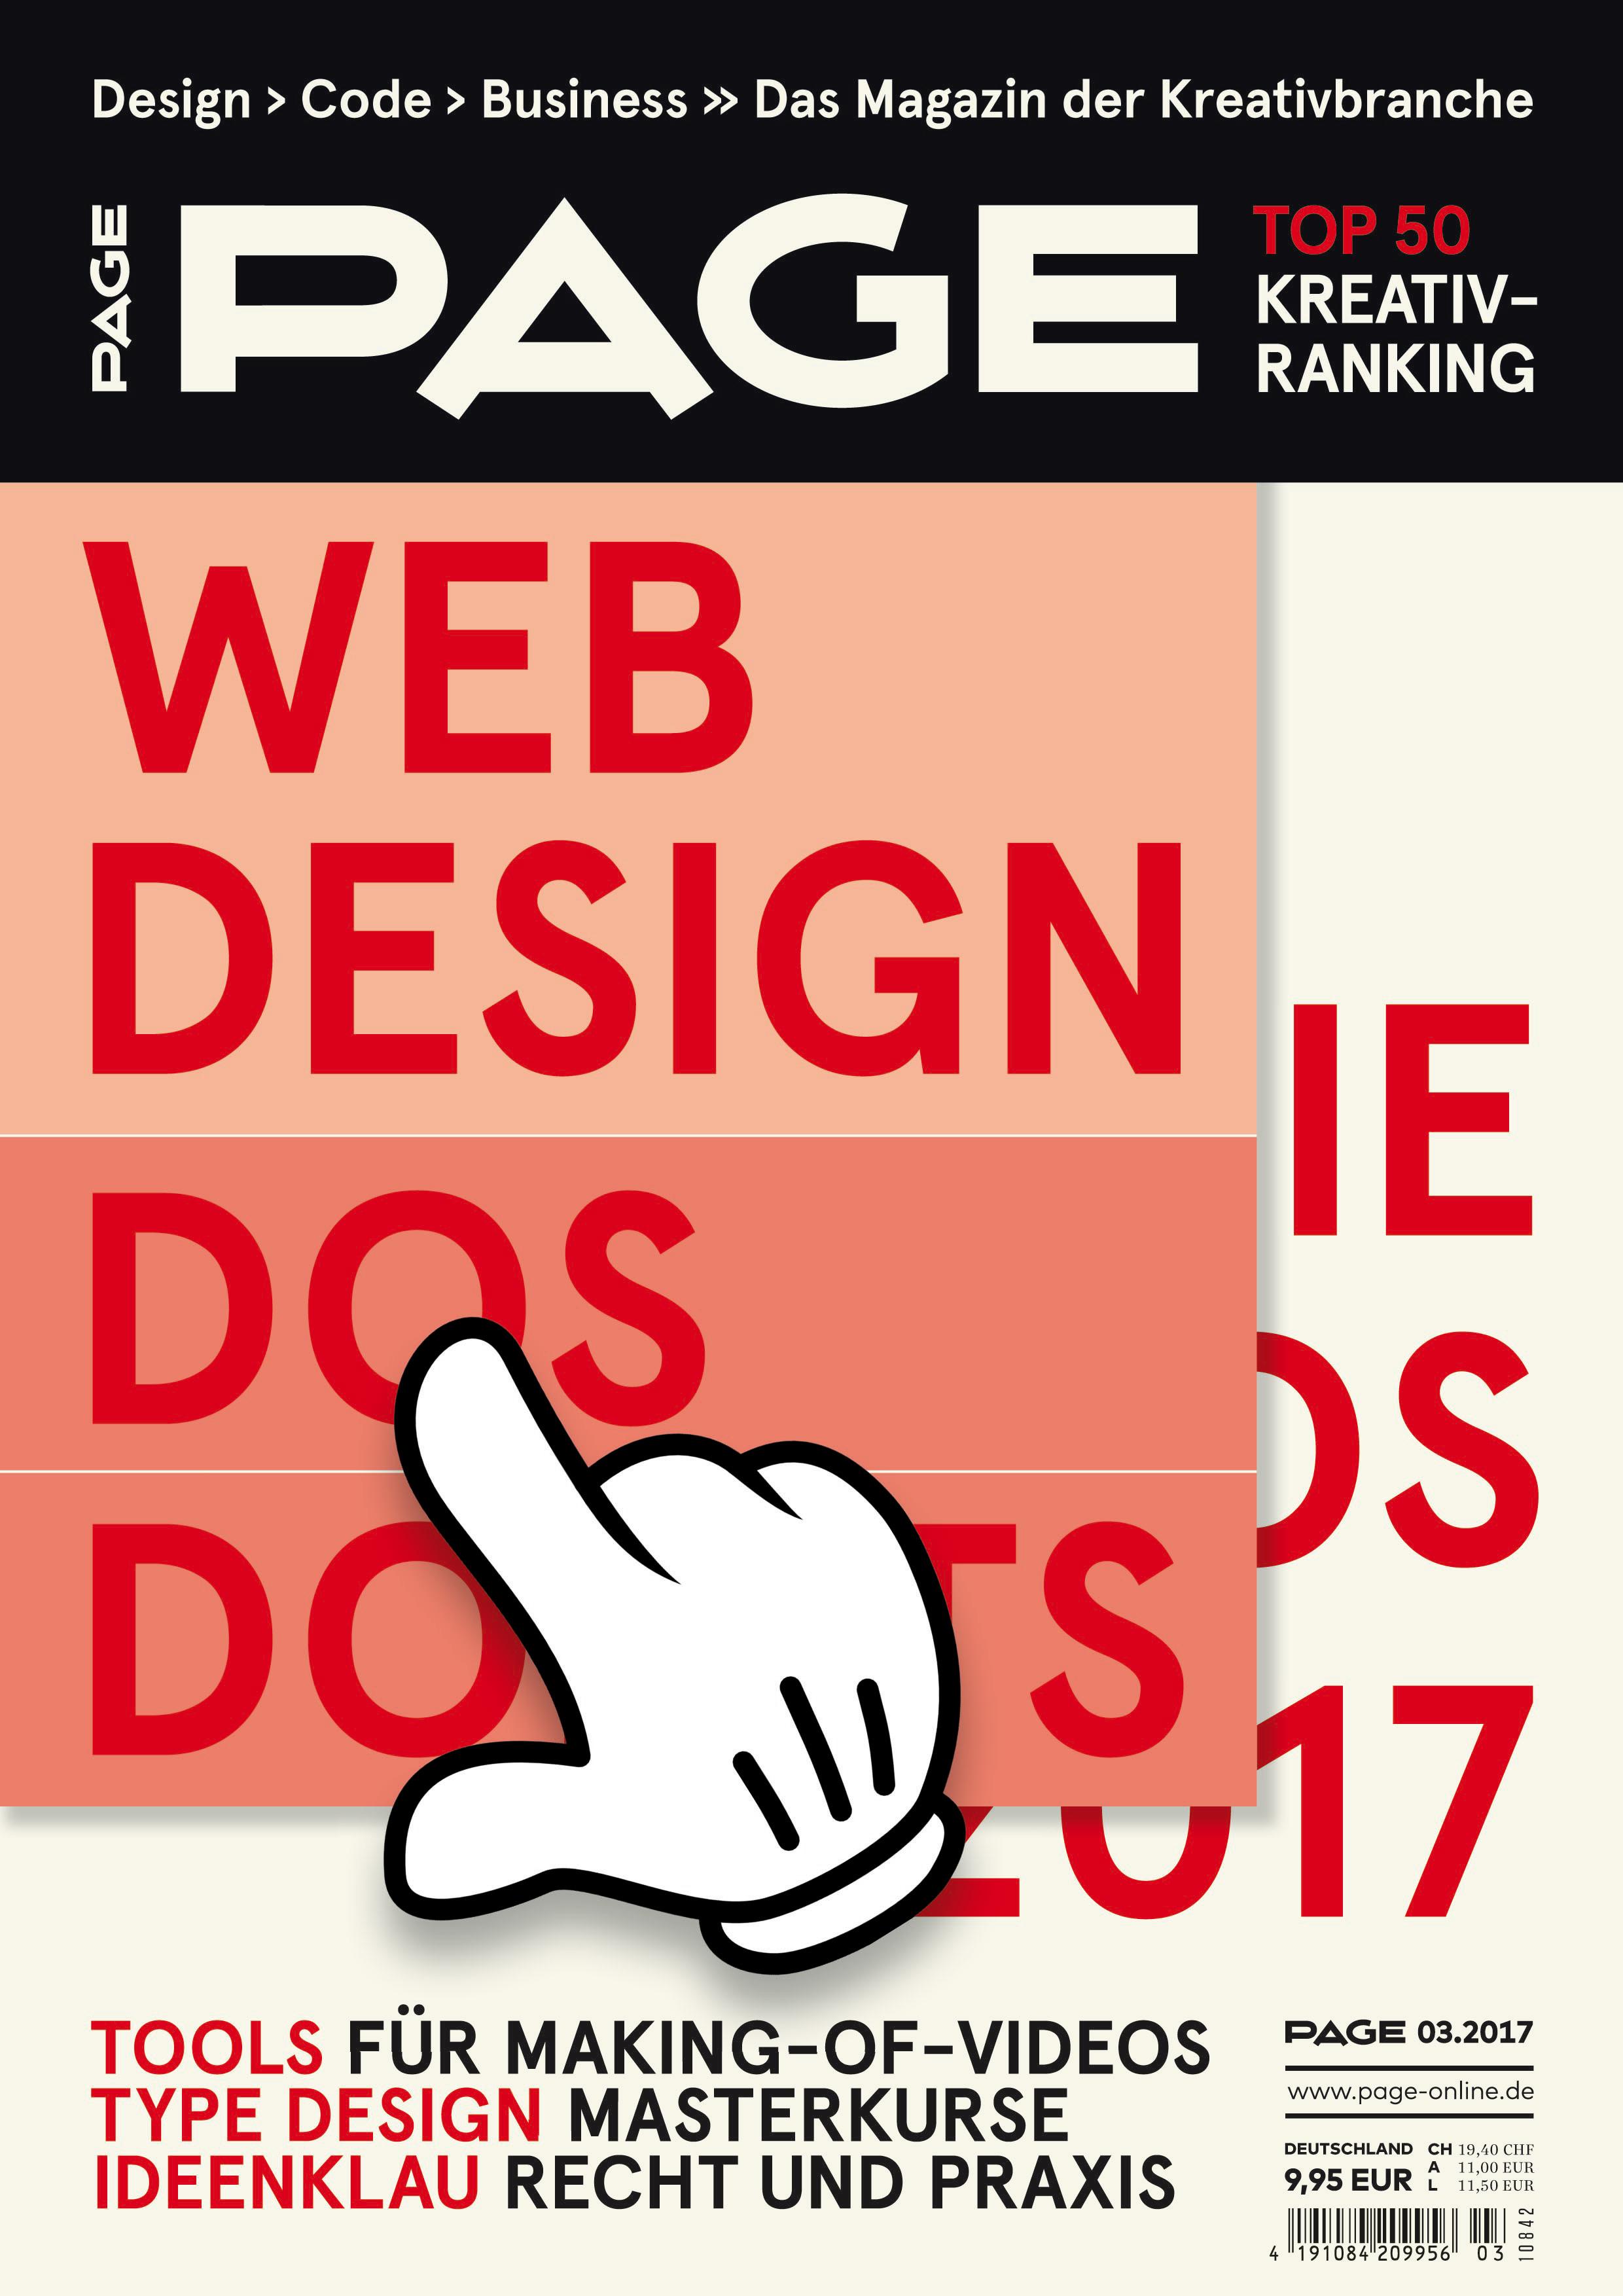 Webdesign, Trends, Google, Mobile, SEO, Template, Typografie, Freelancer, Webdesigner, Entwickler